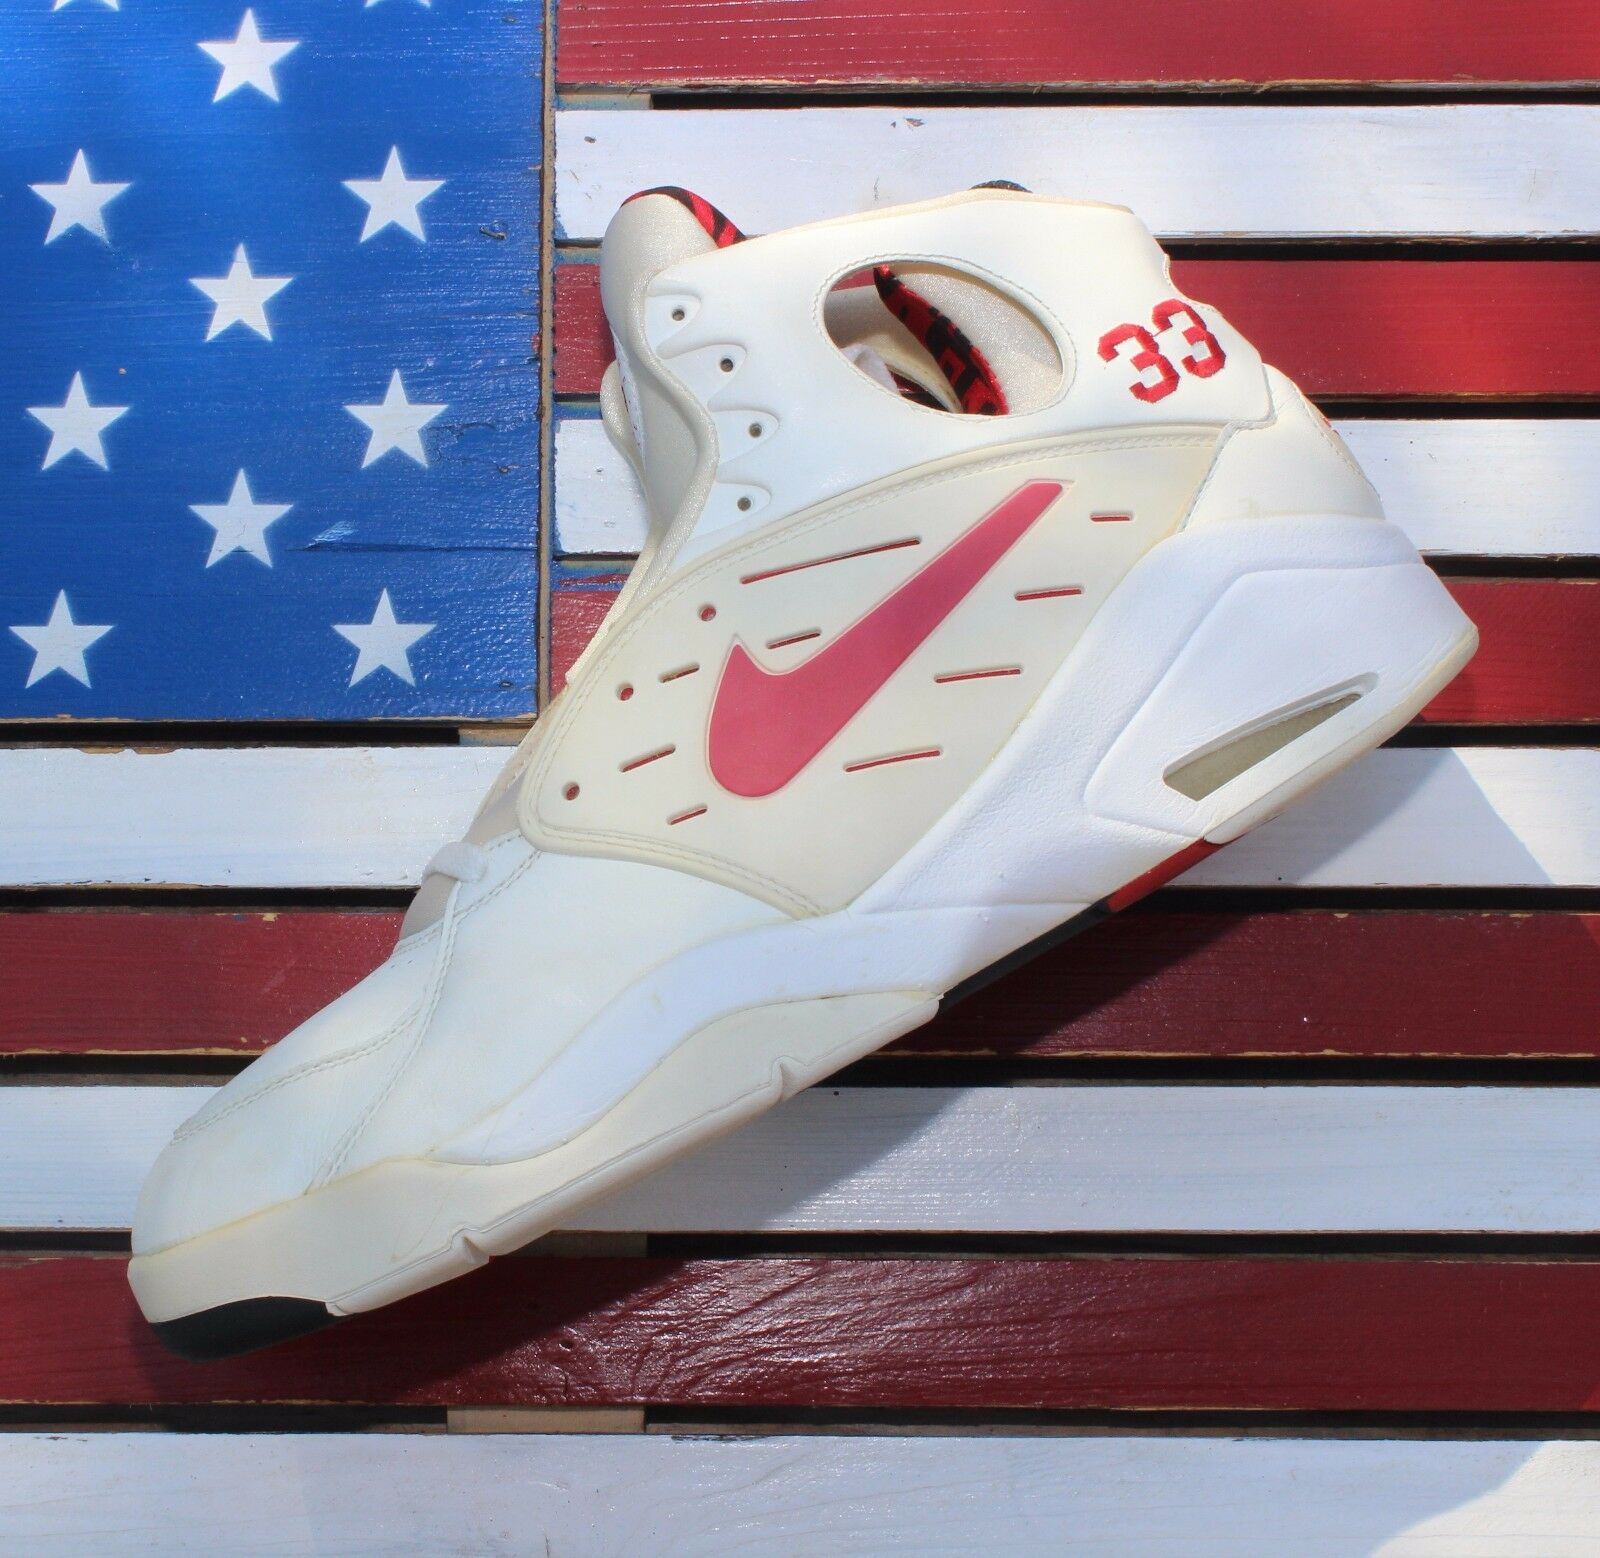 Nike Dynamic Flight Scottie Pippen 1992 PLAYER EXCLUSIVE Sample PE VTG Original